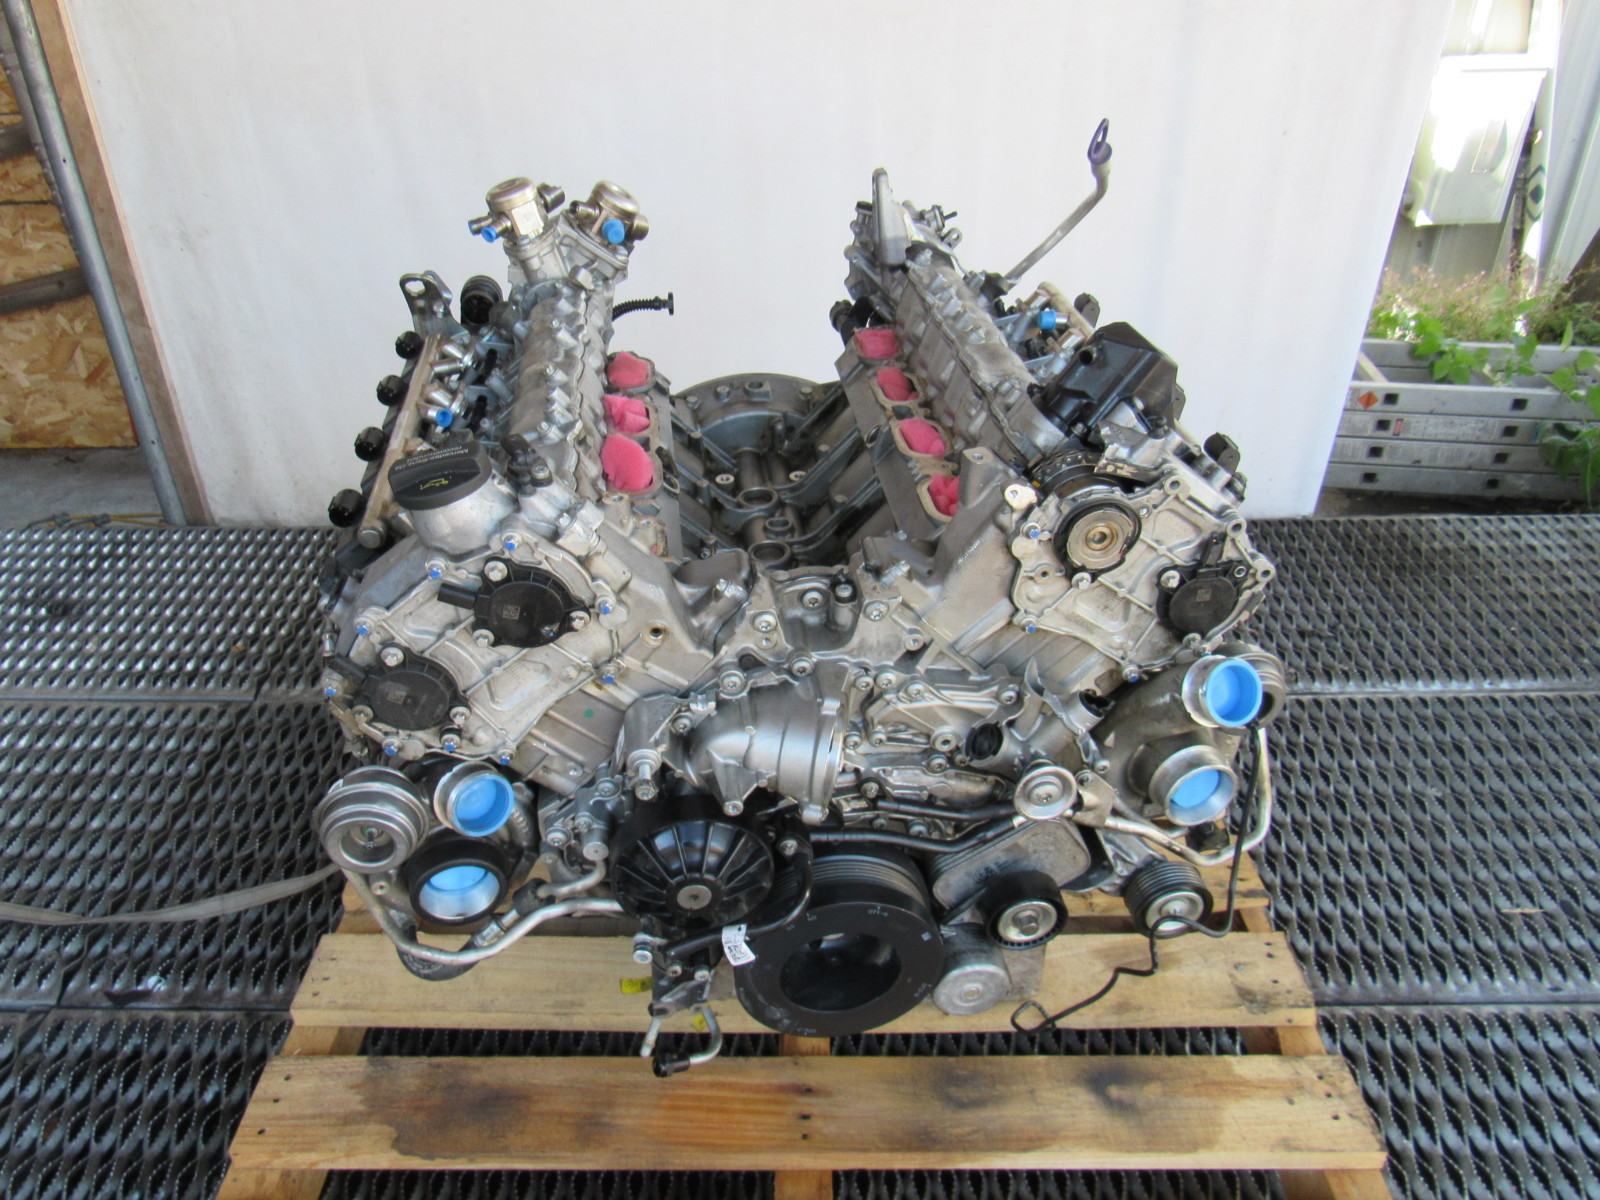 17 Mercedes X166 GLS63 engine, V8 twin turbo 1570108100 ...